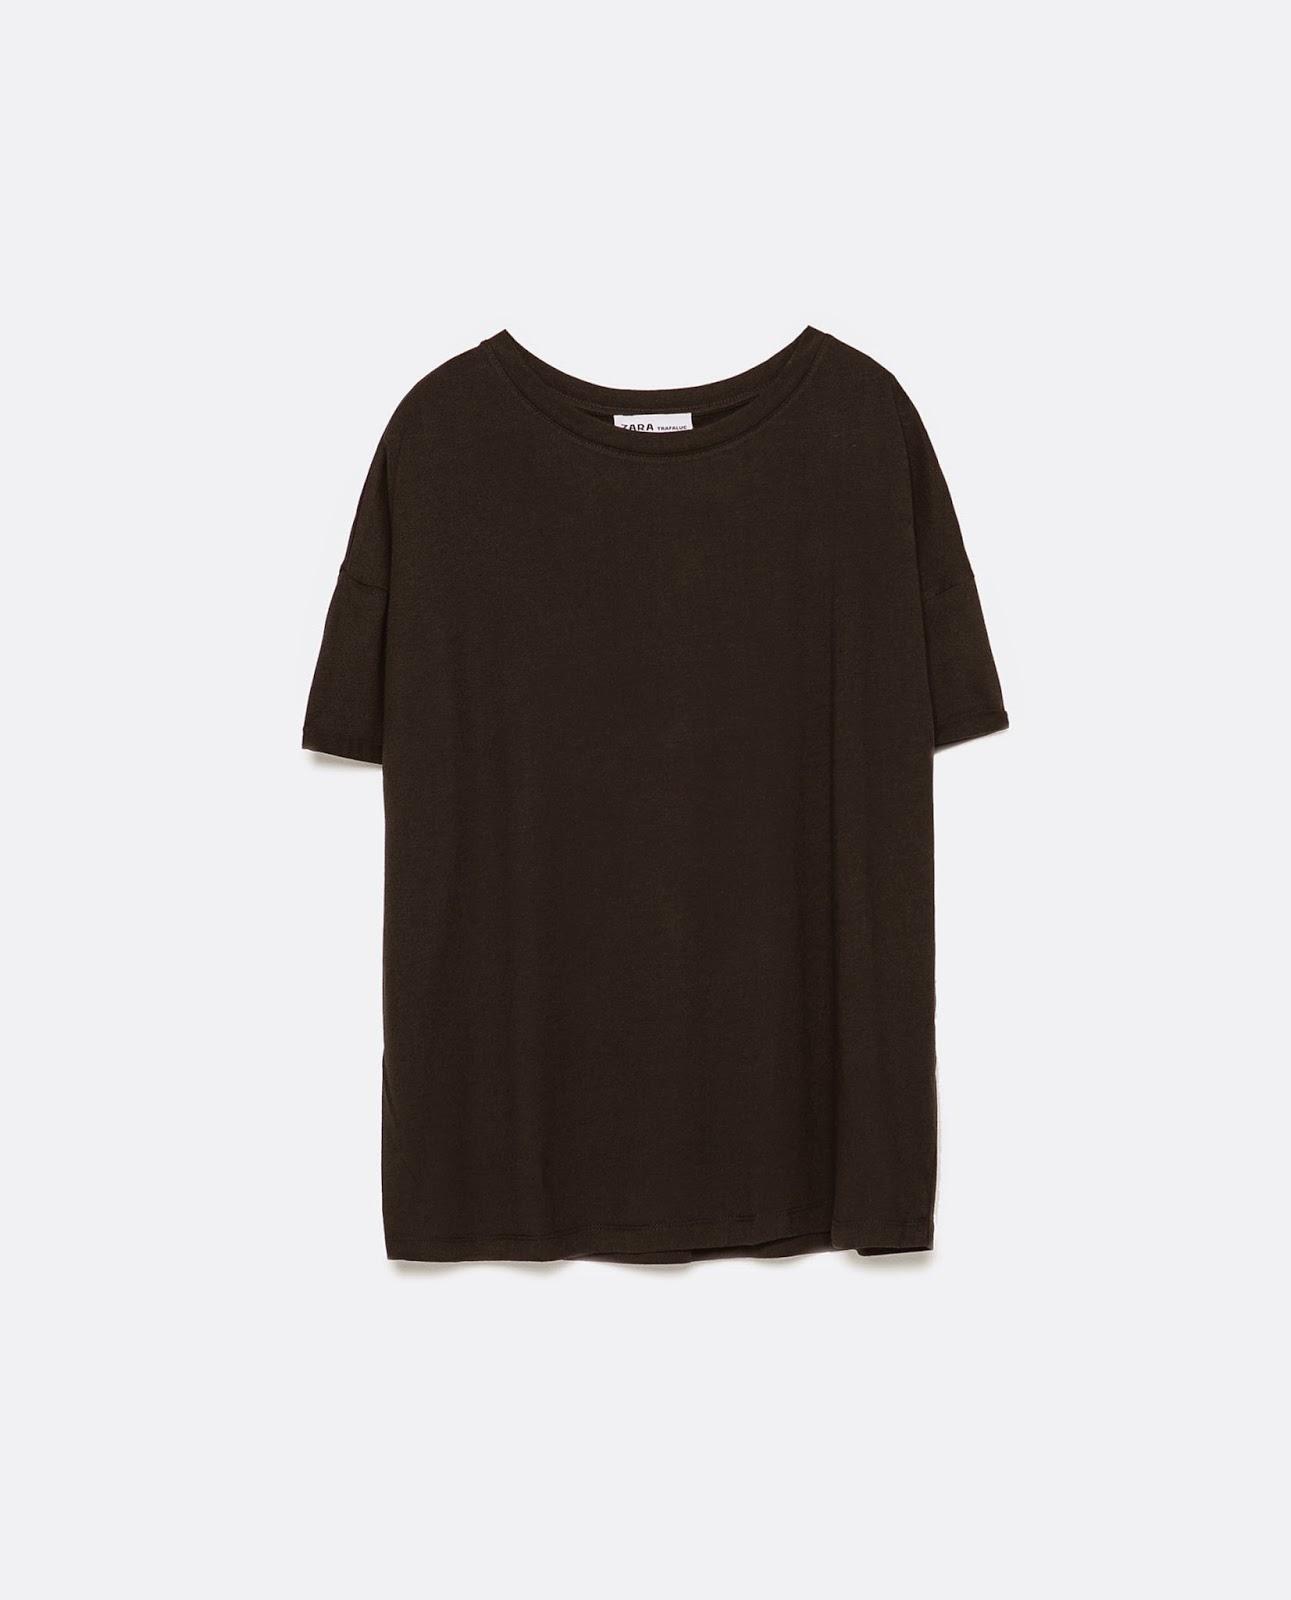 Total Look Zara, Style, Cool, Blog de Moda, Shopping, Life Style, Hippy Chic